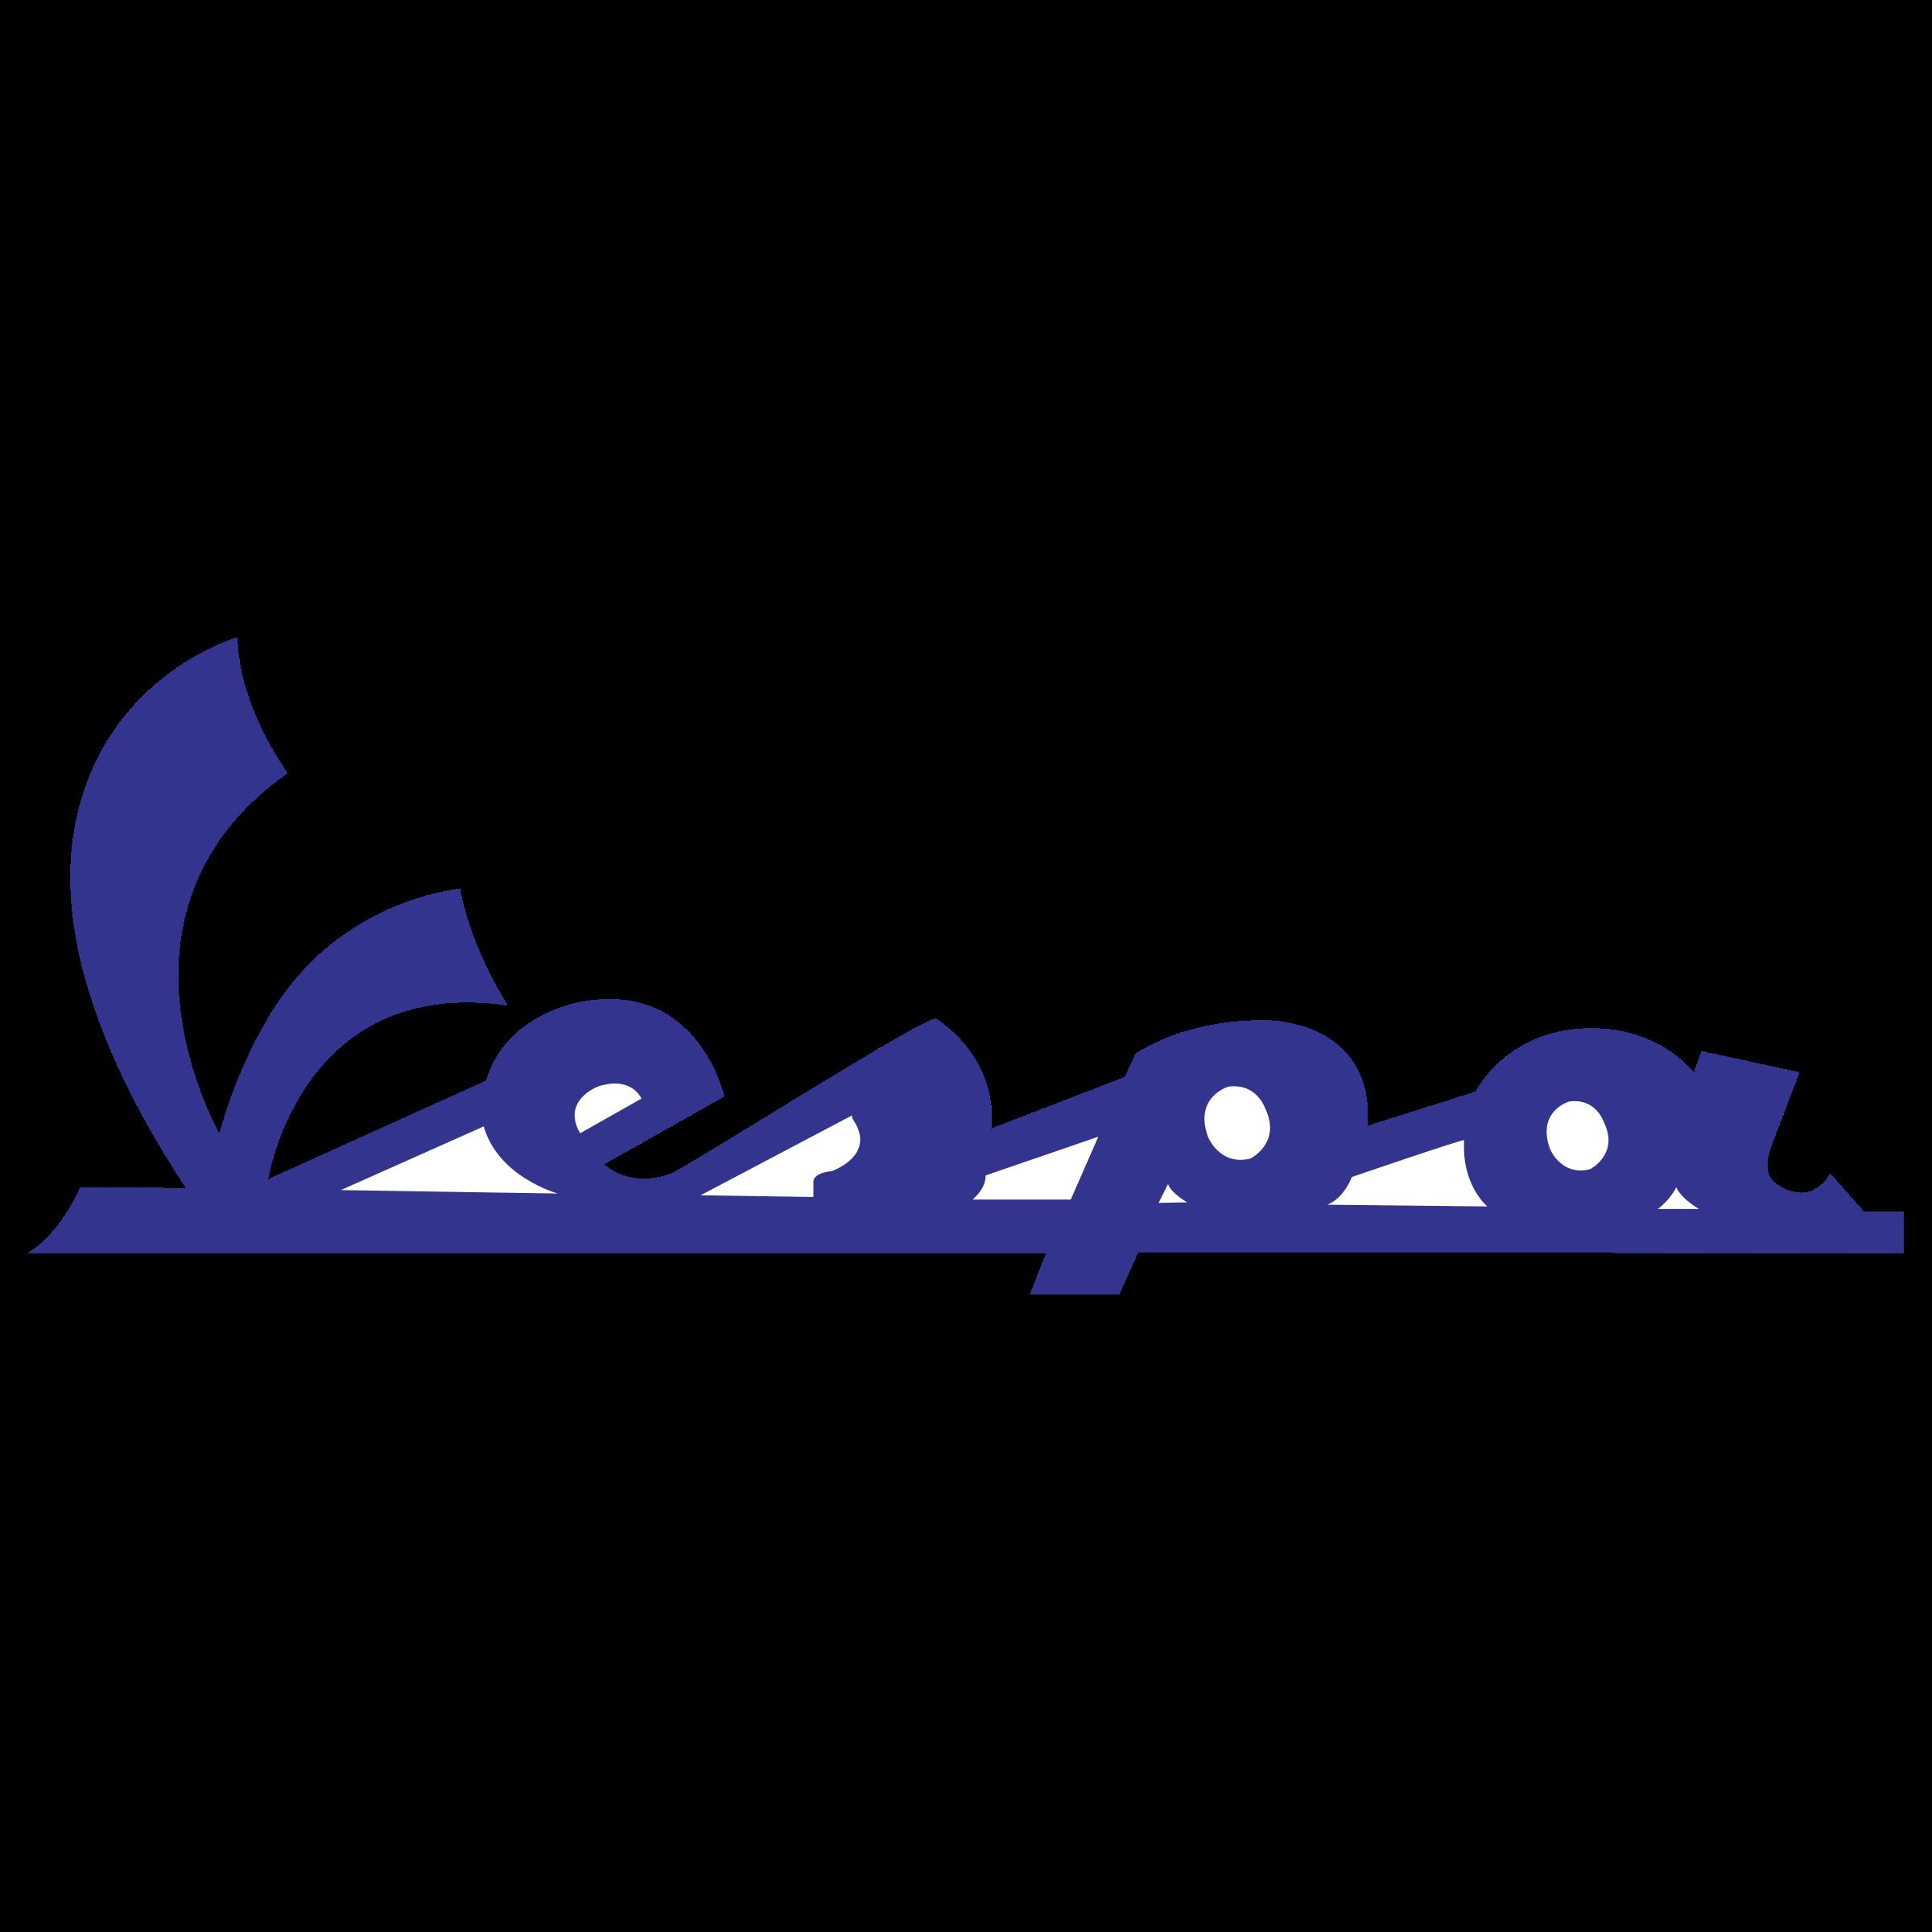 vespa logo png transparent svg vector freebie supply rh freebiesupply com vespa logo vector png vespa logo vector png